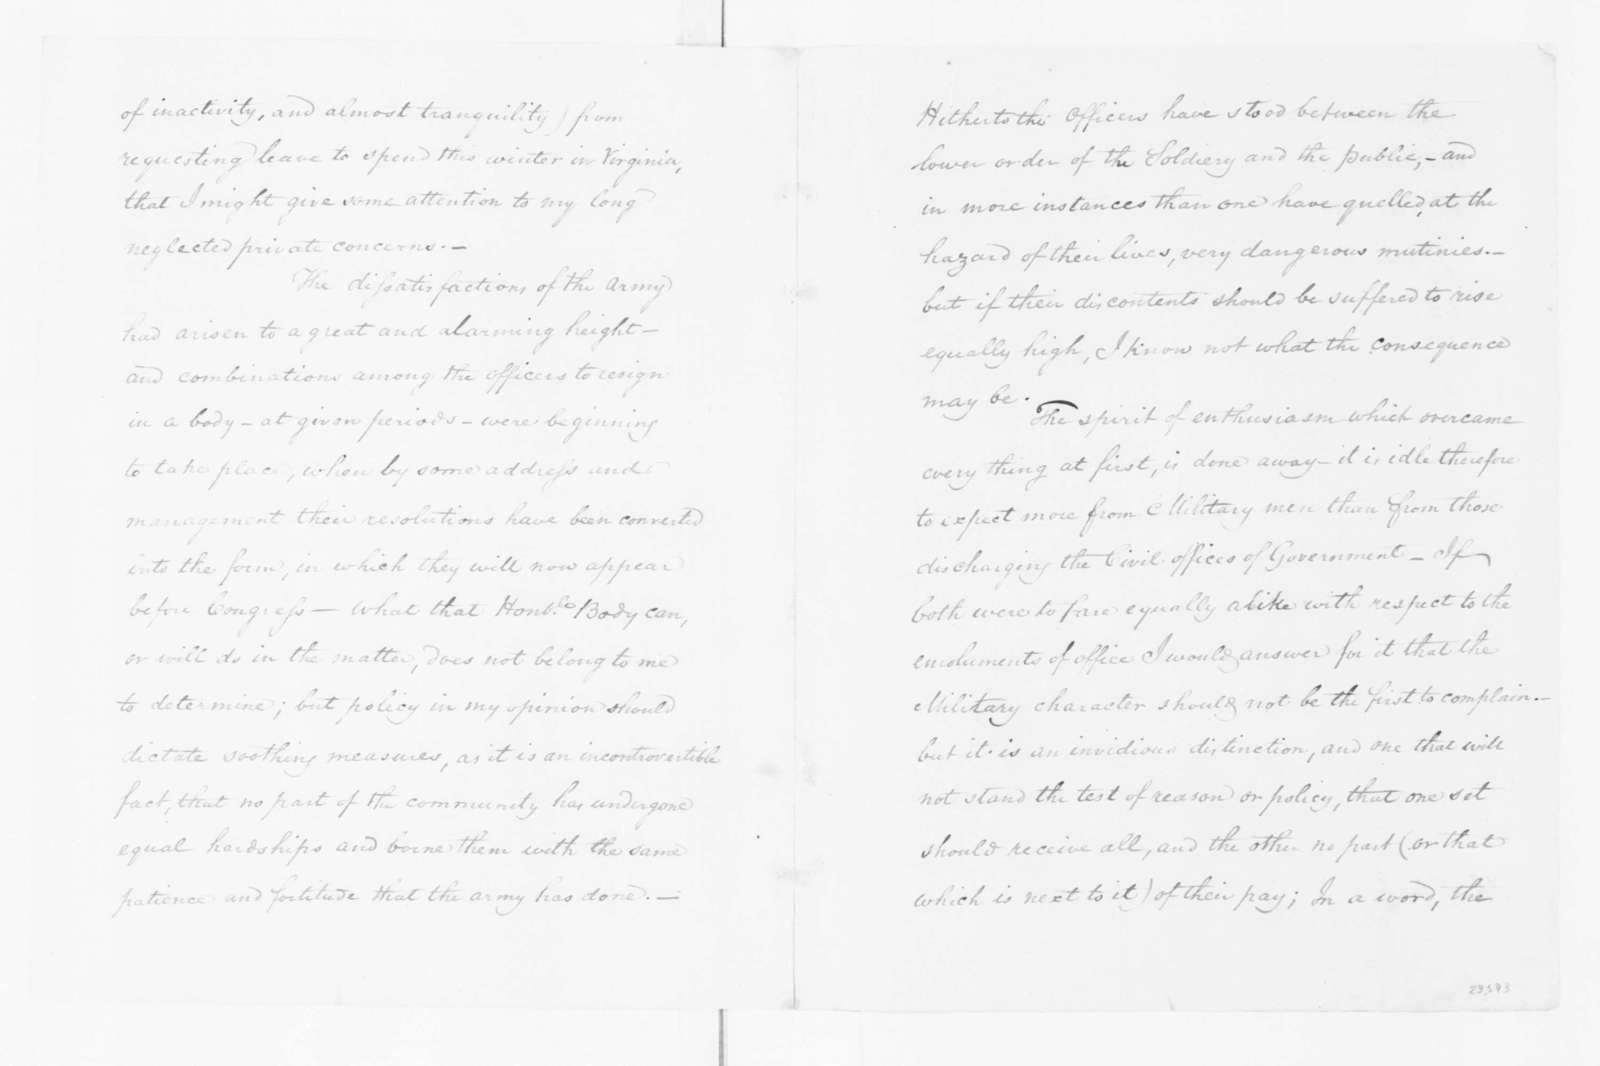 George Washington to Joseph Jones, December 14, 1782.